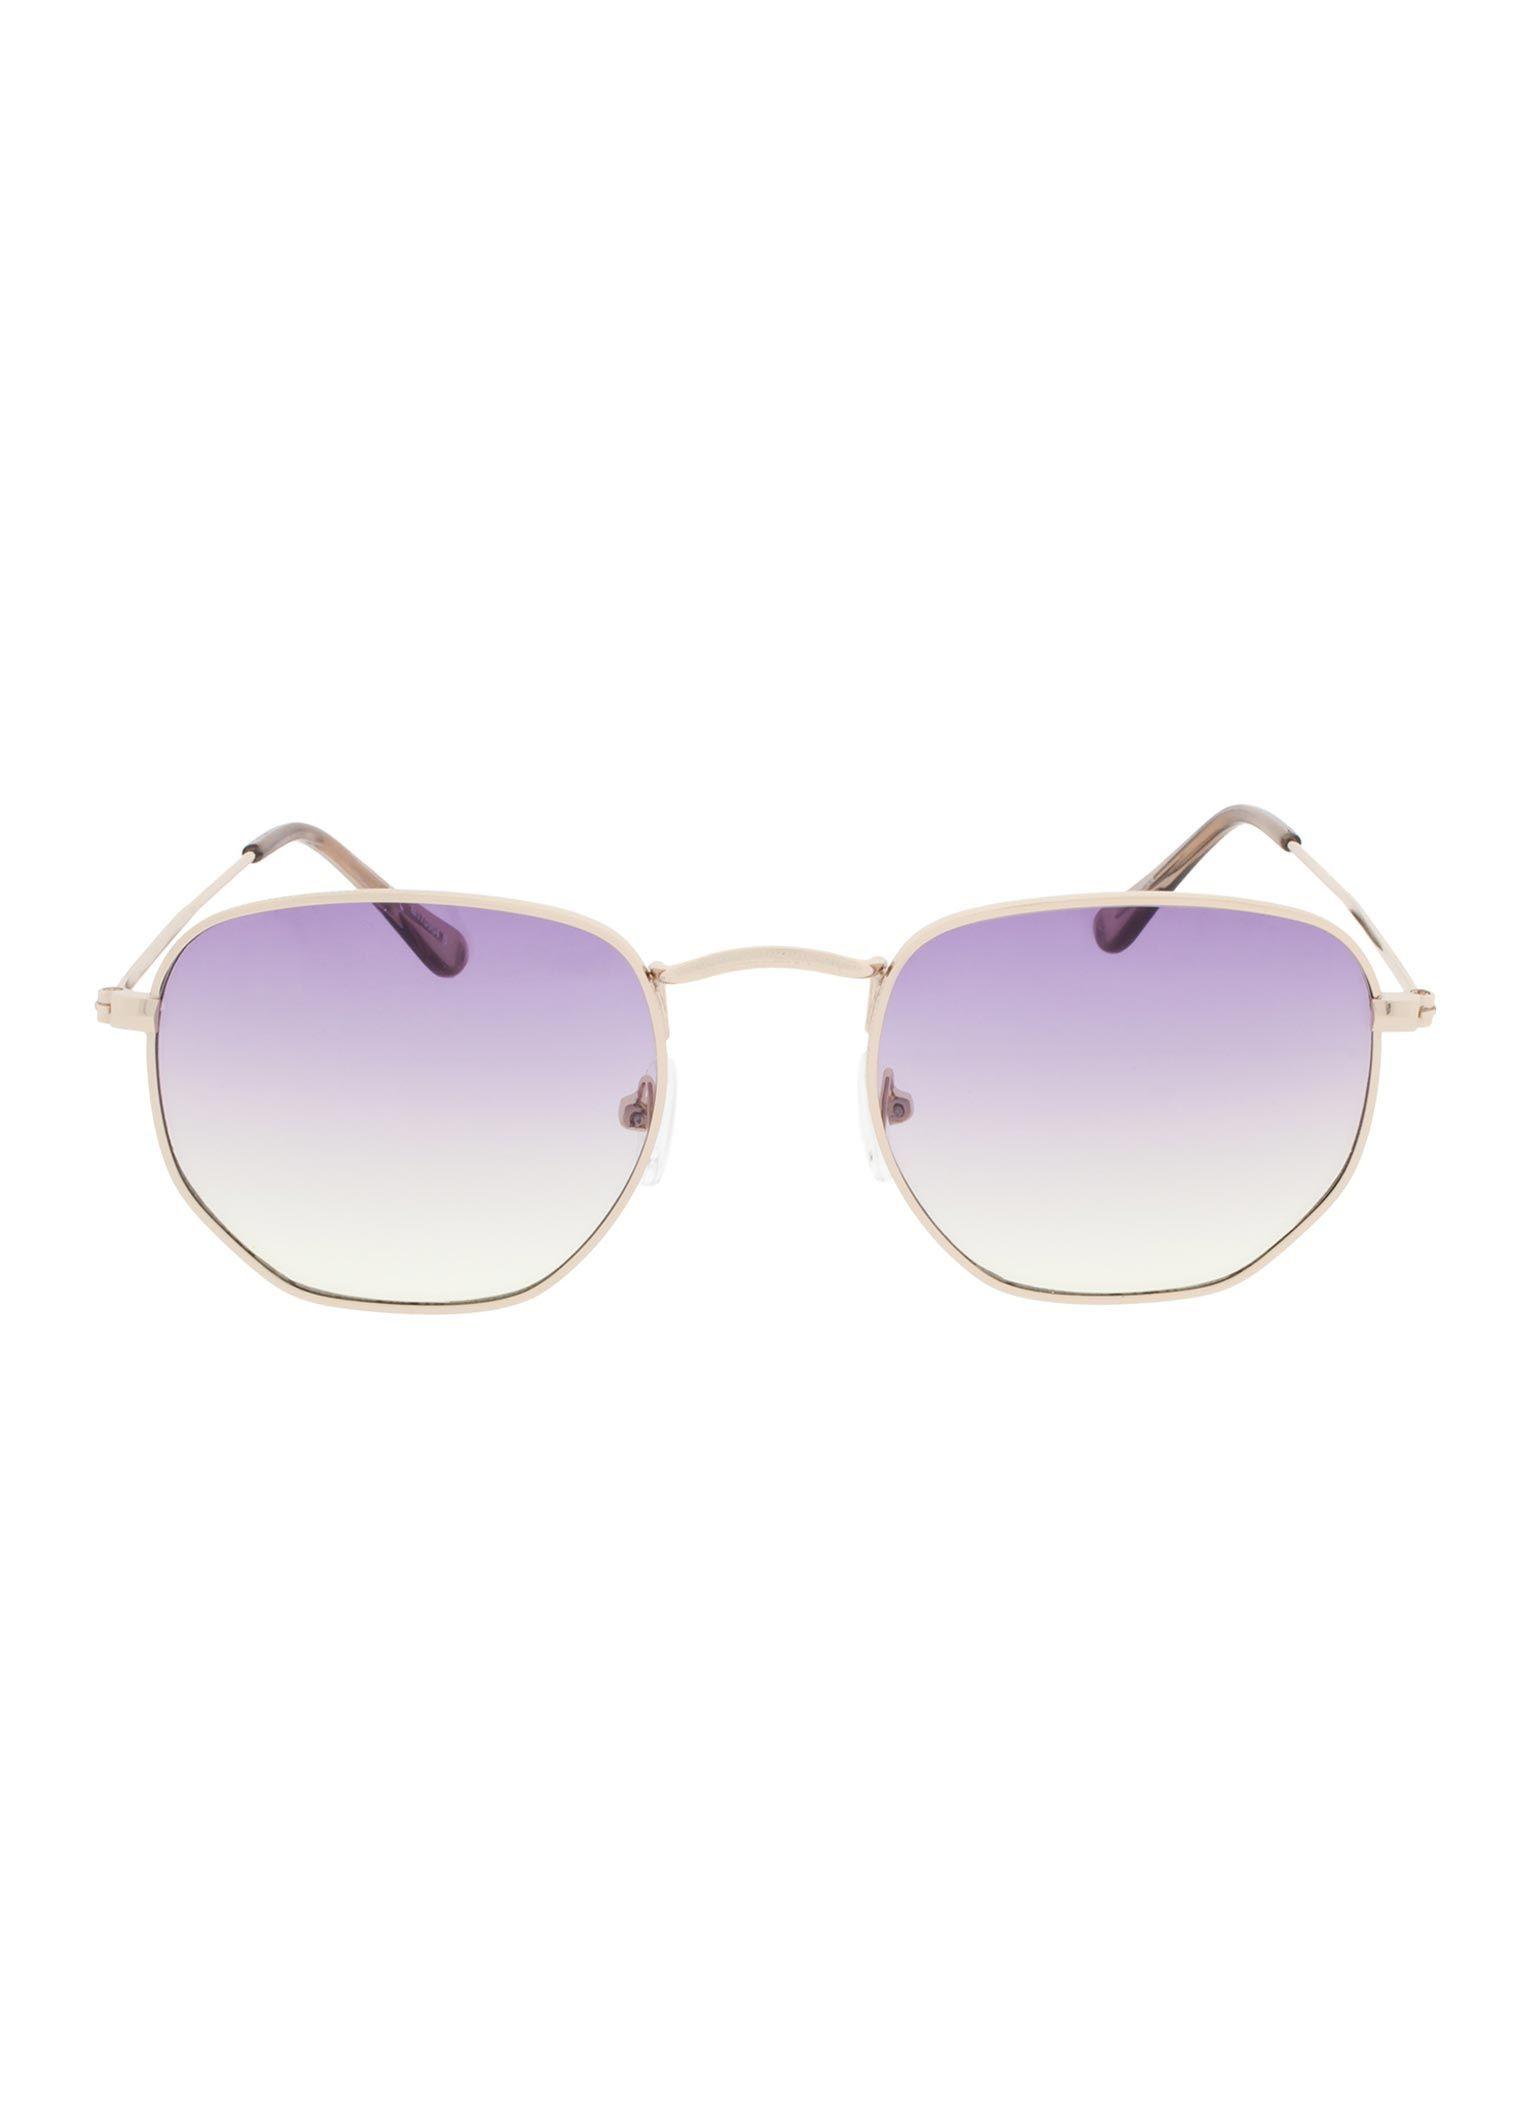 Afbeelding van Icon Eyewear M170904 M170904 Zonnebril Gold